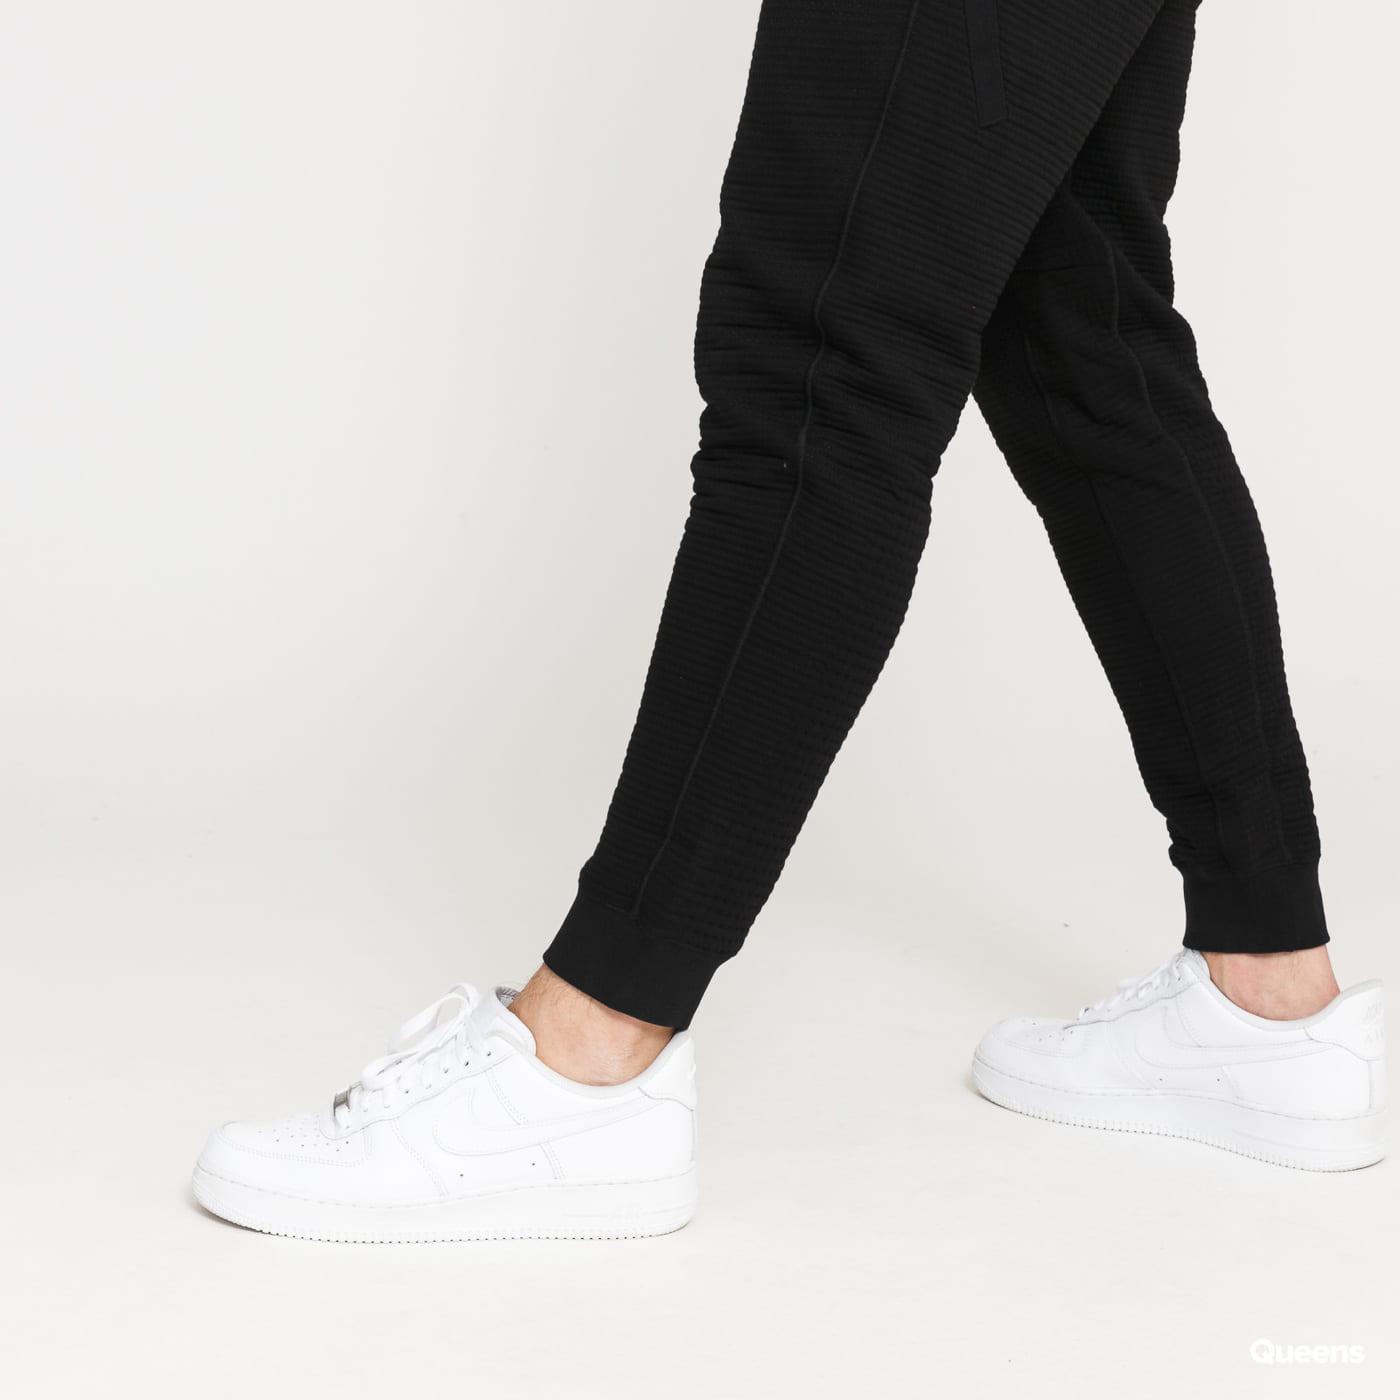 Nike M NSW Tech Pack Pant ENG black